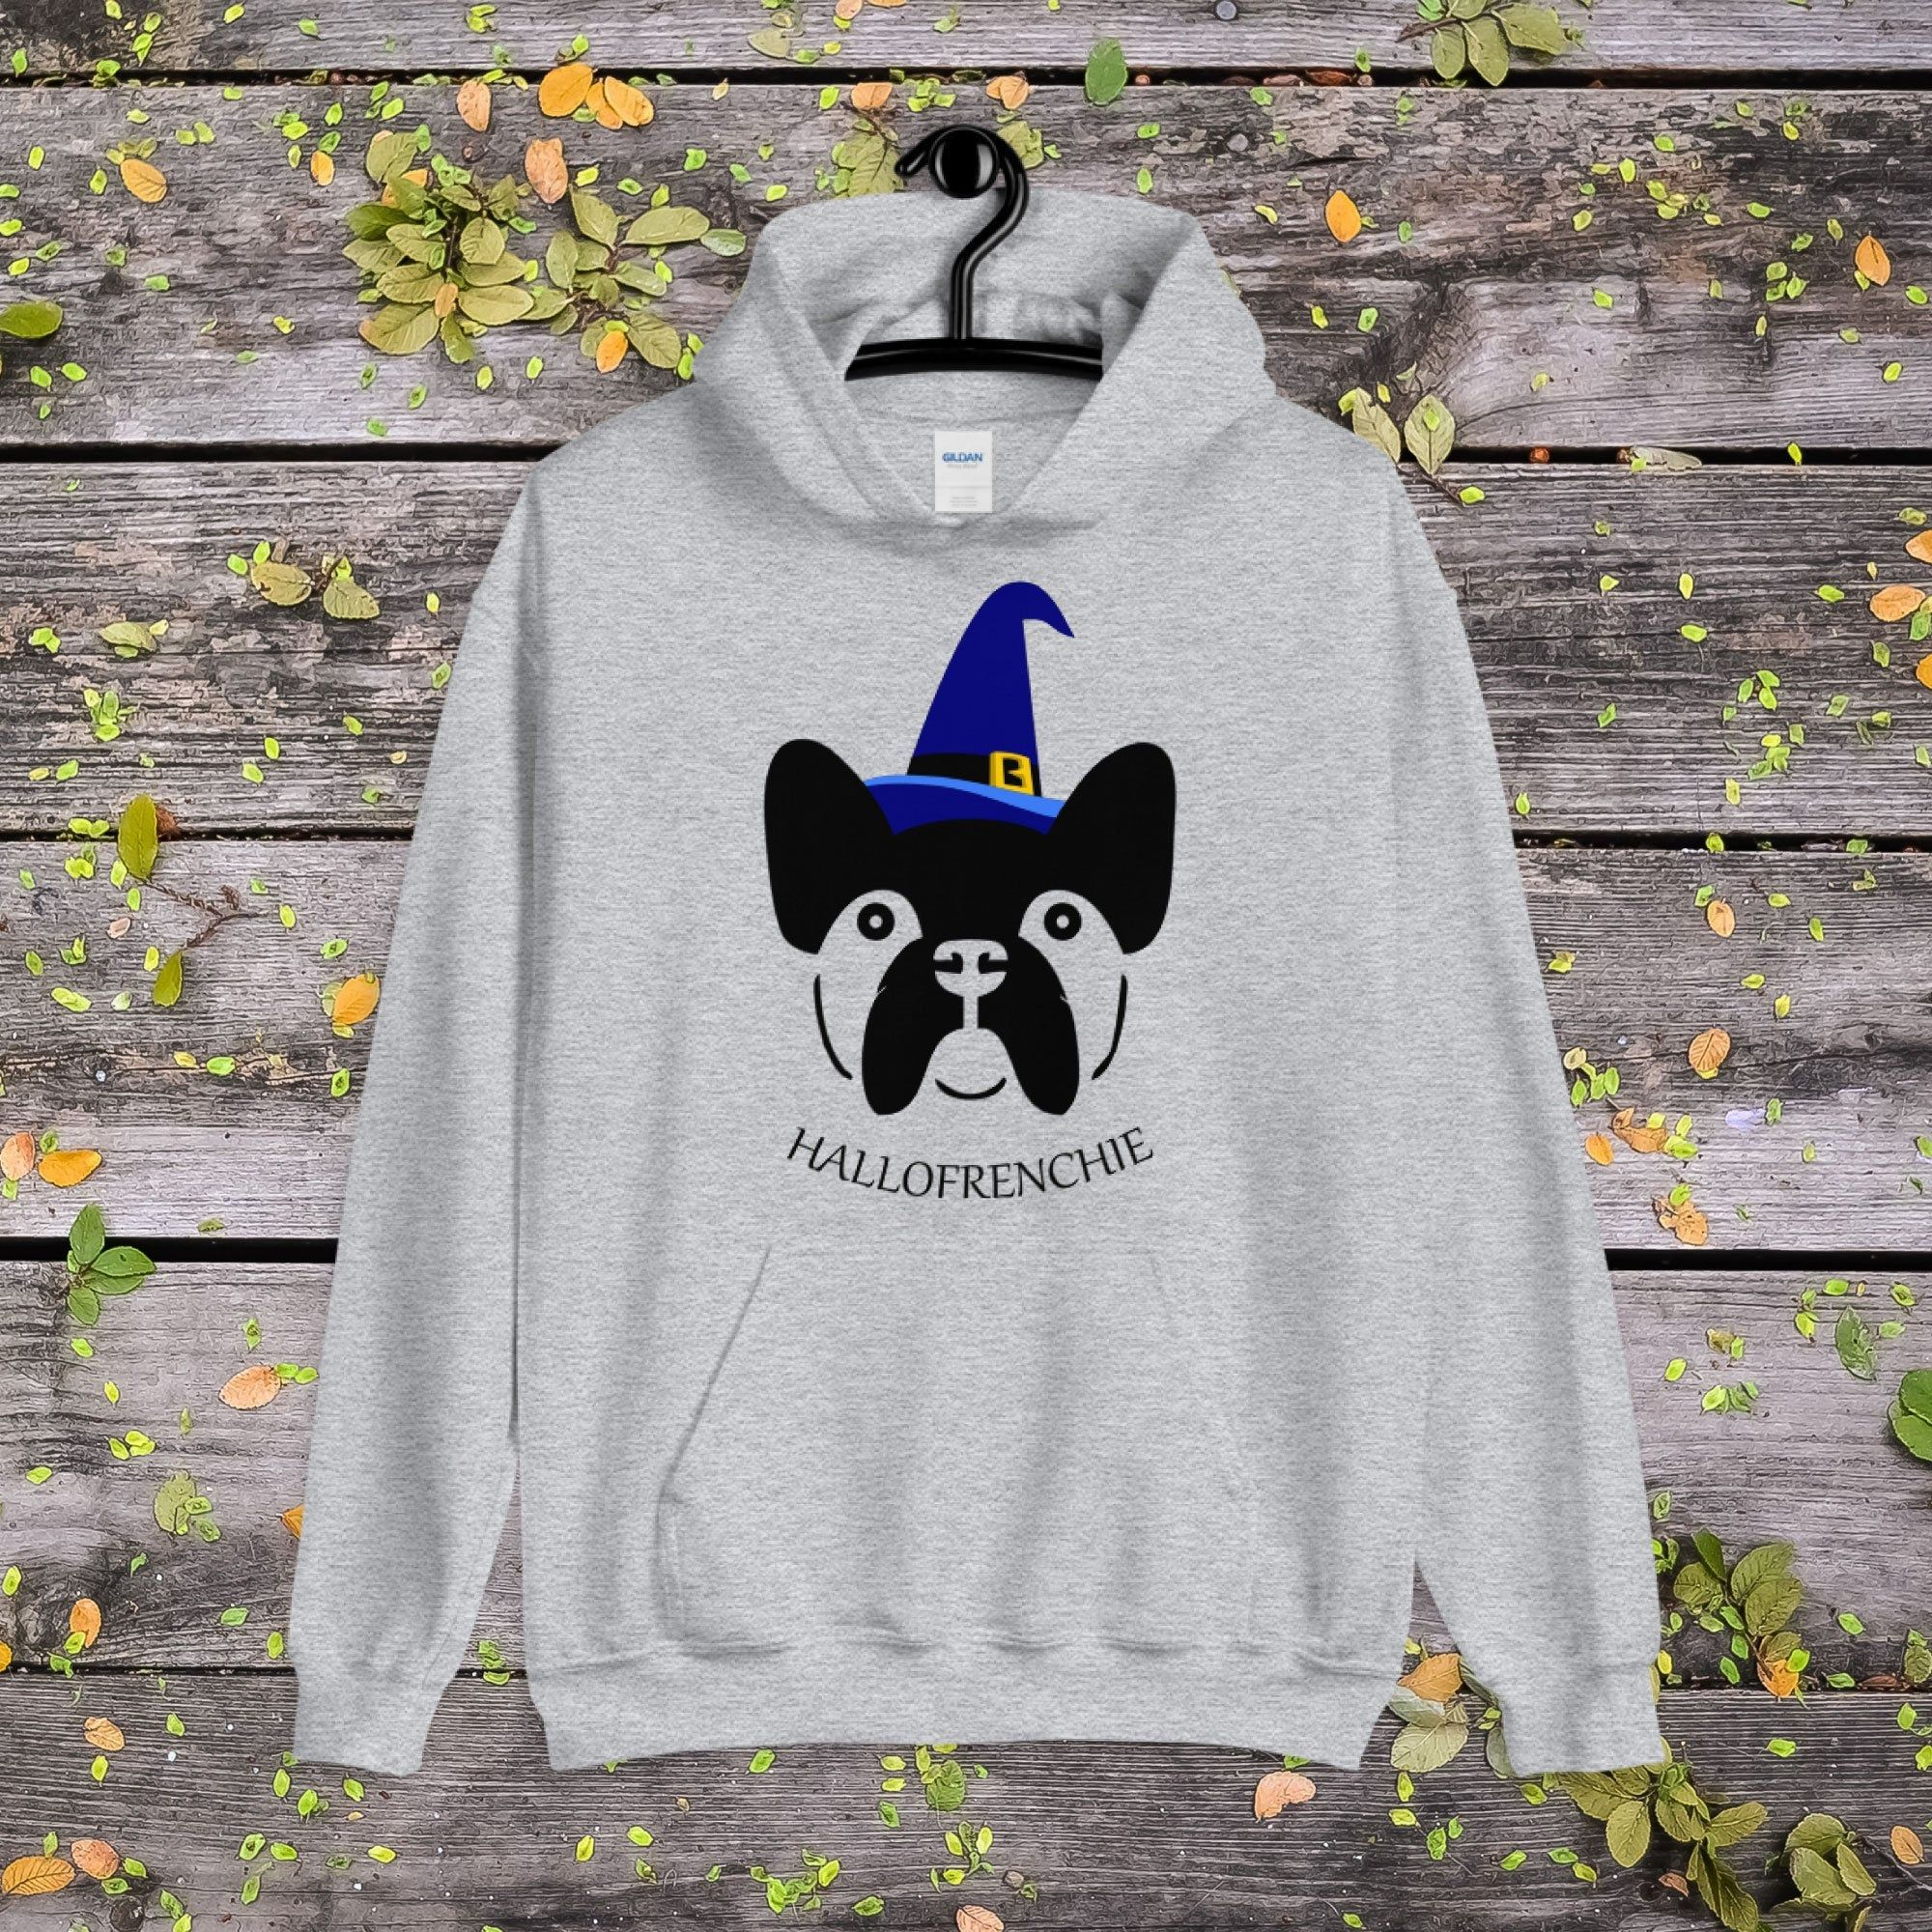 Halloween French Bulldog Hoodie, Frenchie Halloween Hoodie